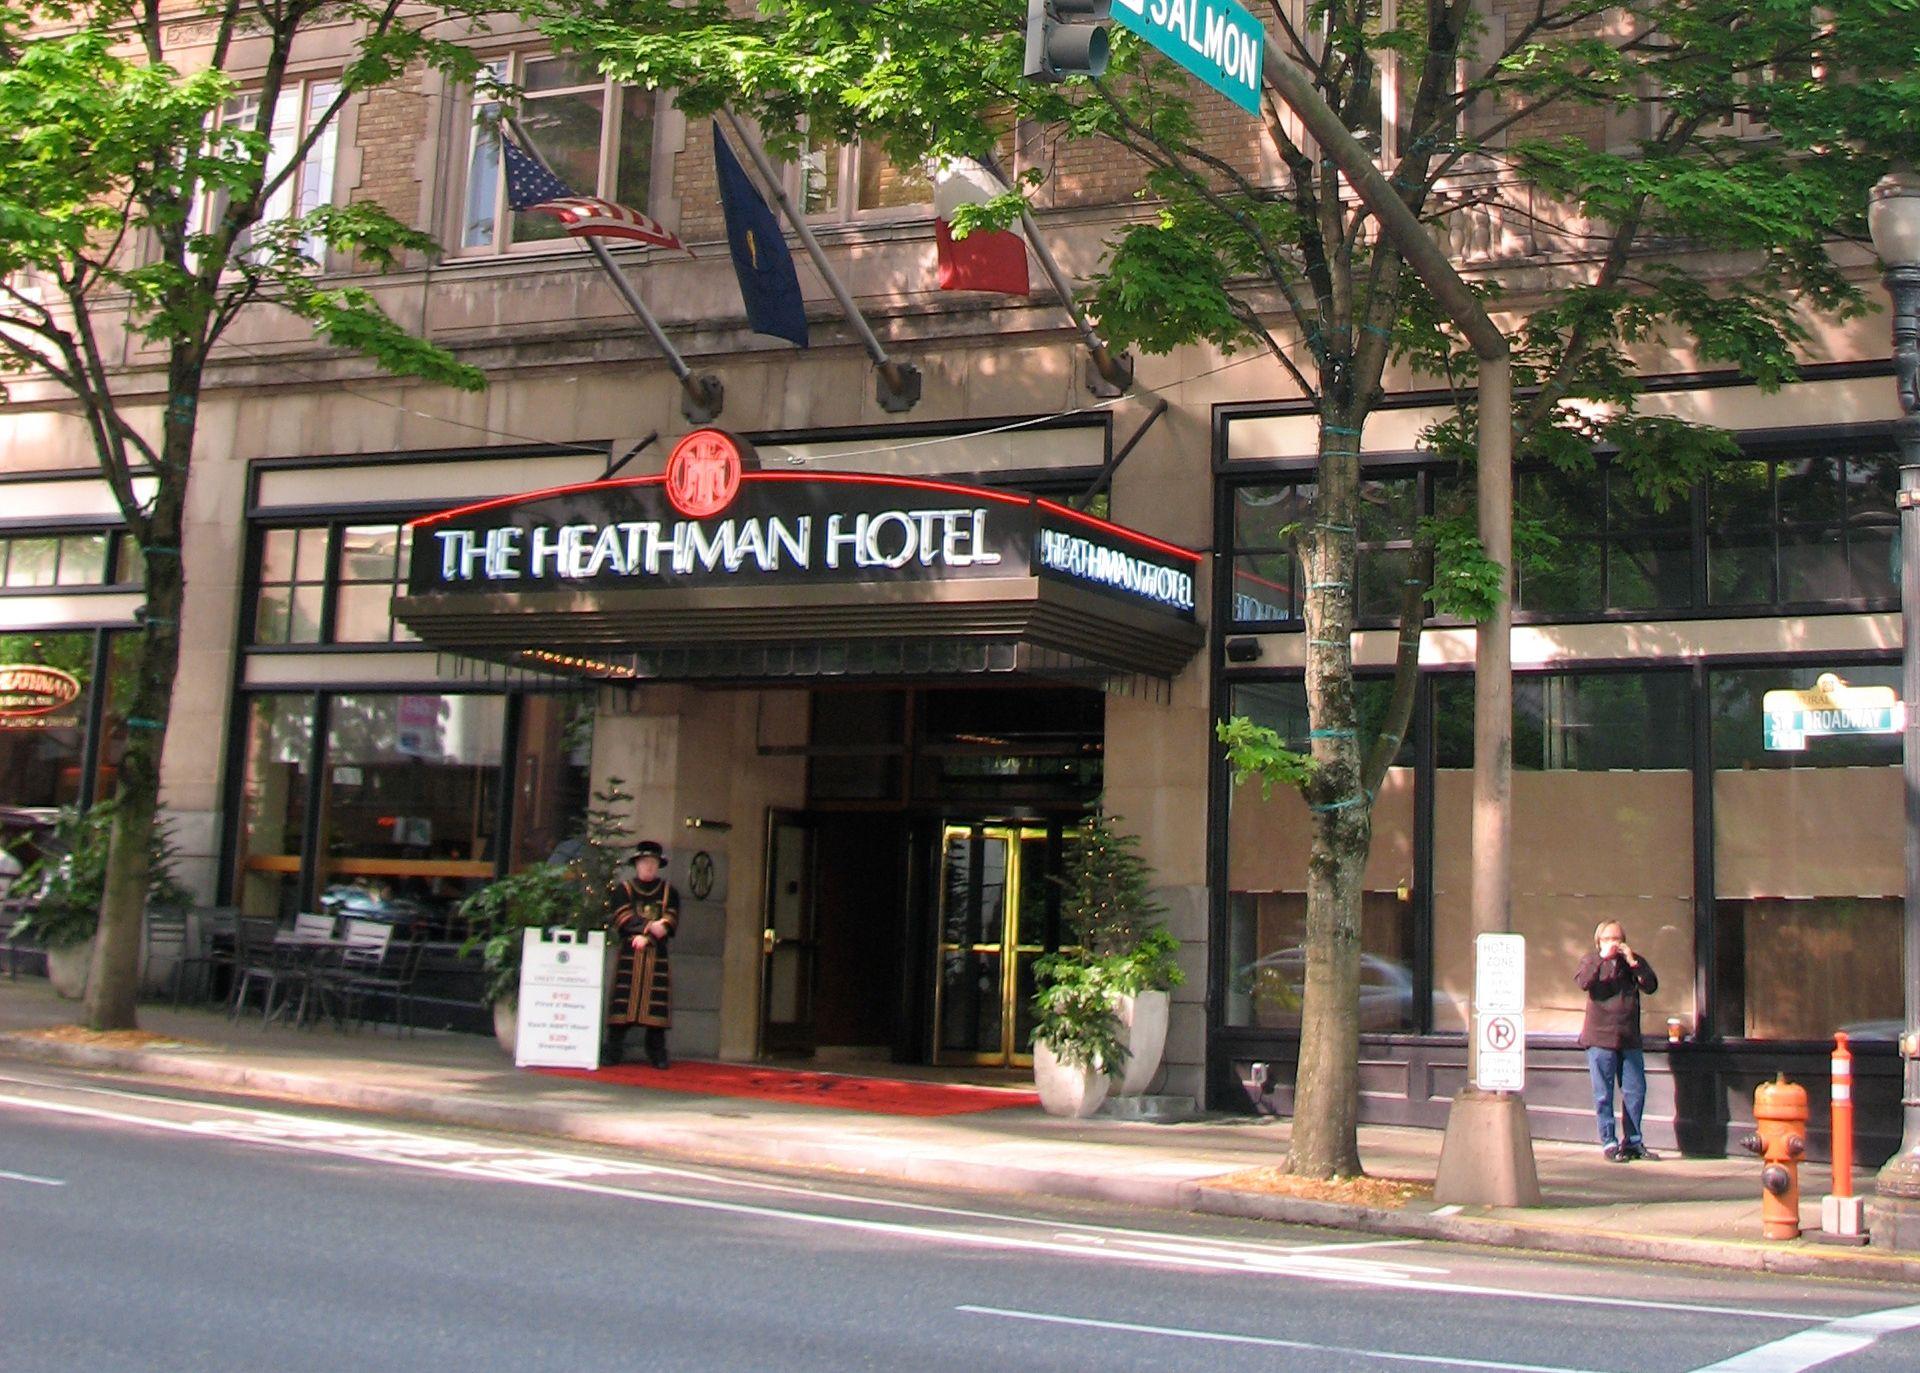 The entrance to Heathman Hotel